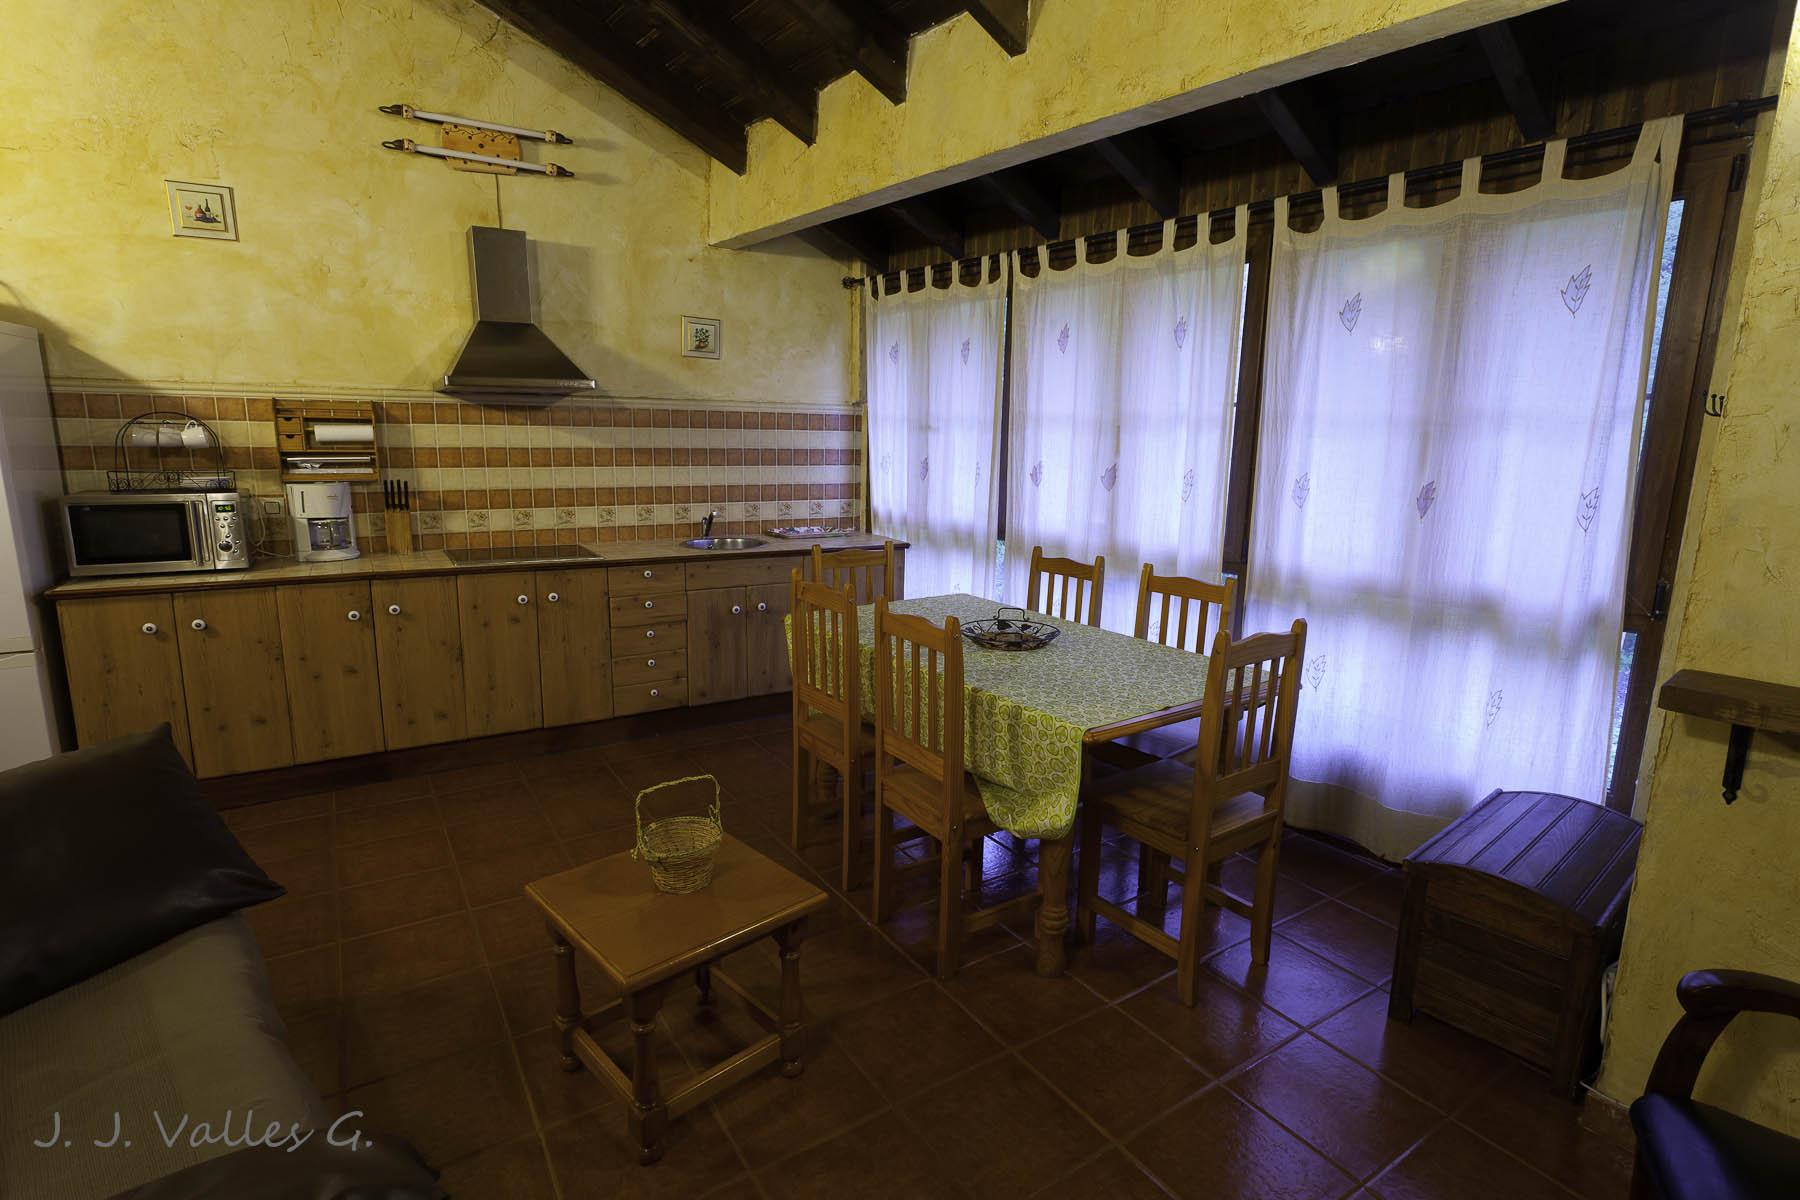 Rurastur Casas Rurales. Asturias. Parque de Redes